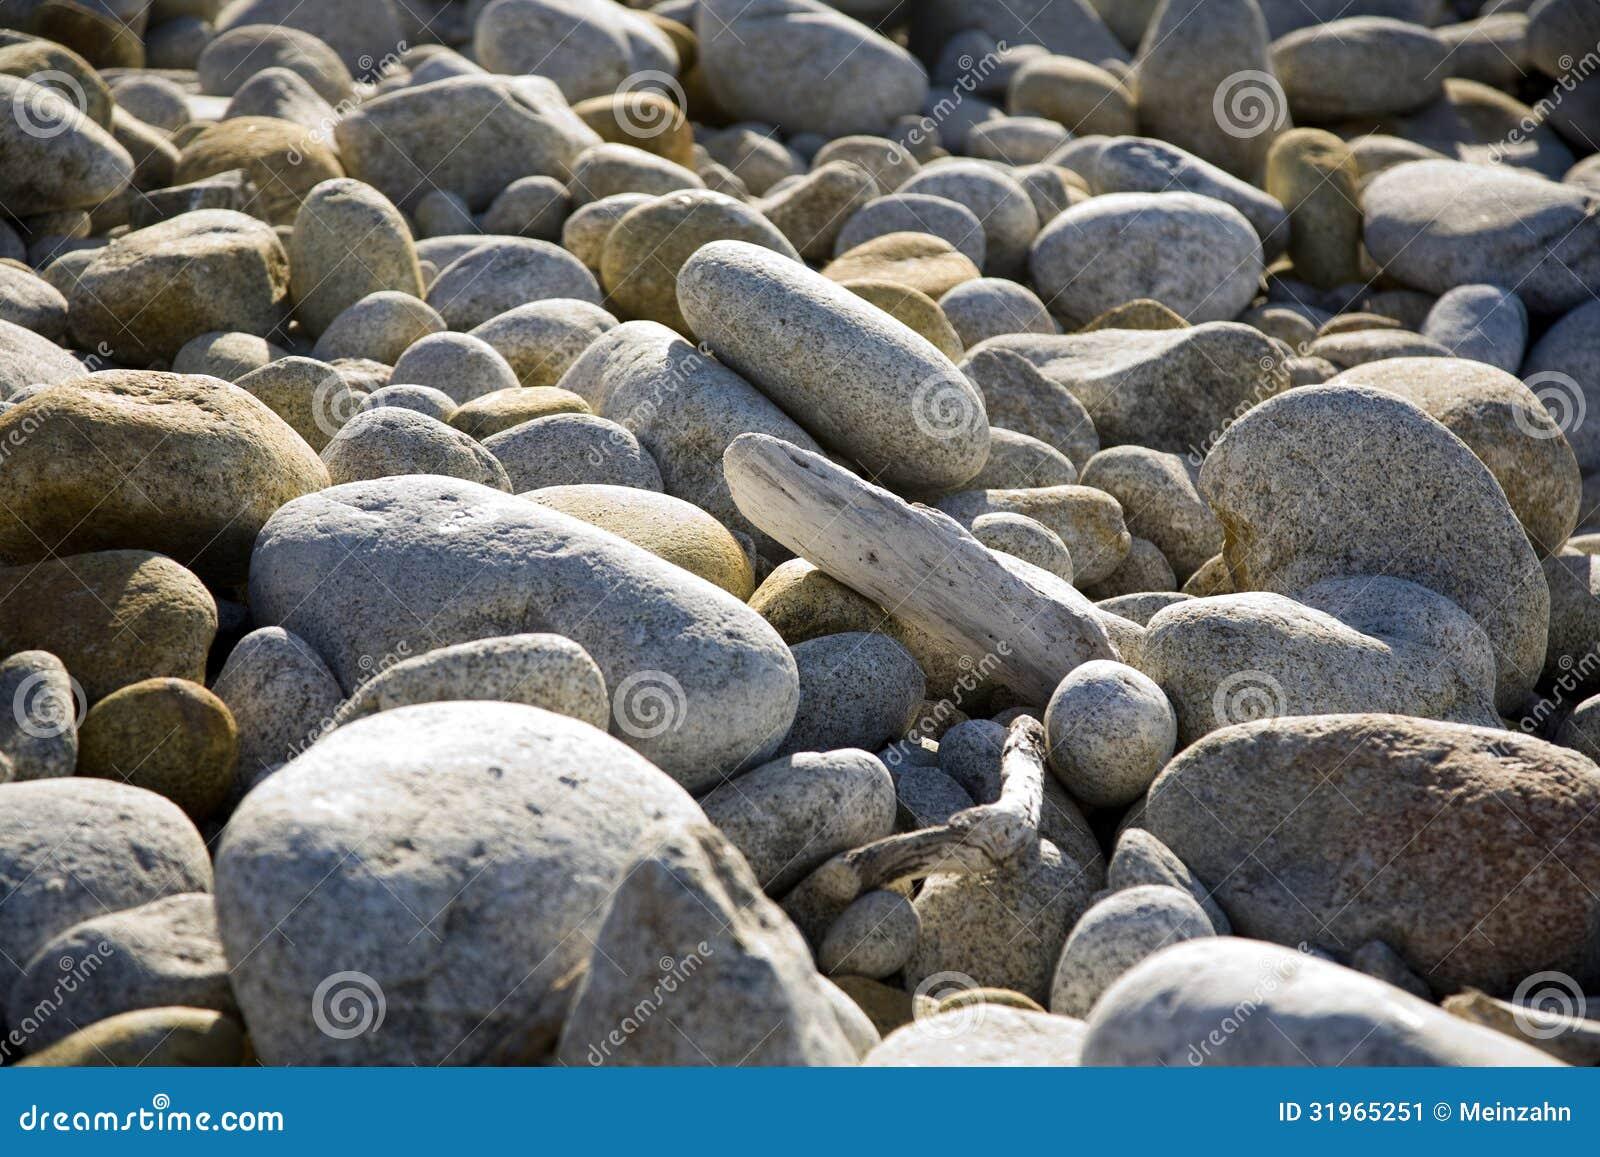 beach hdr stones harmony - photo #13